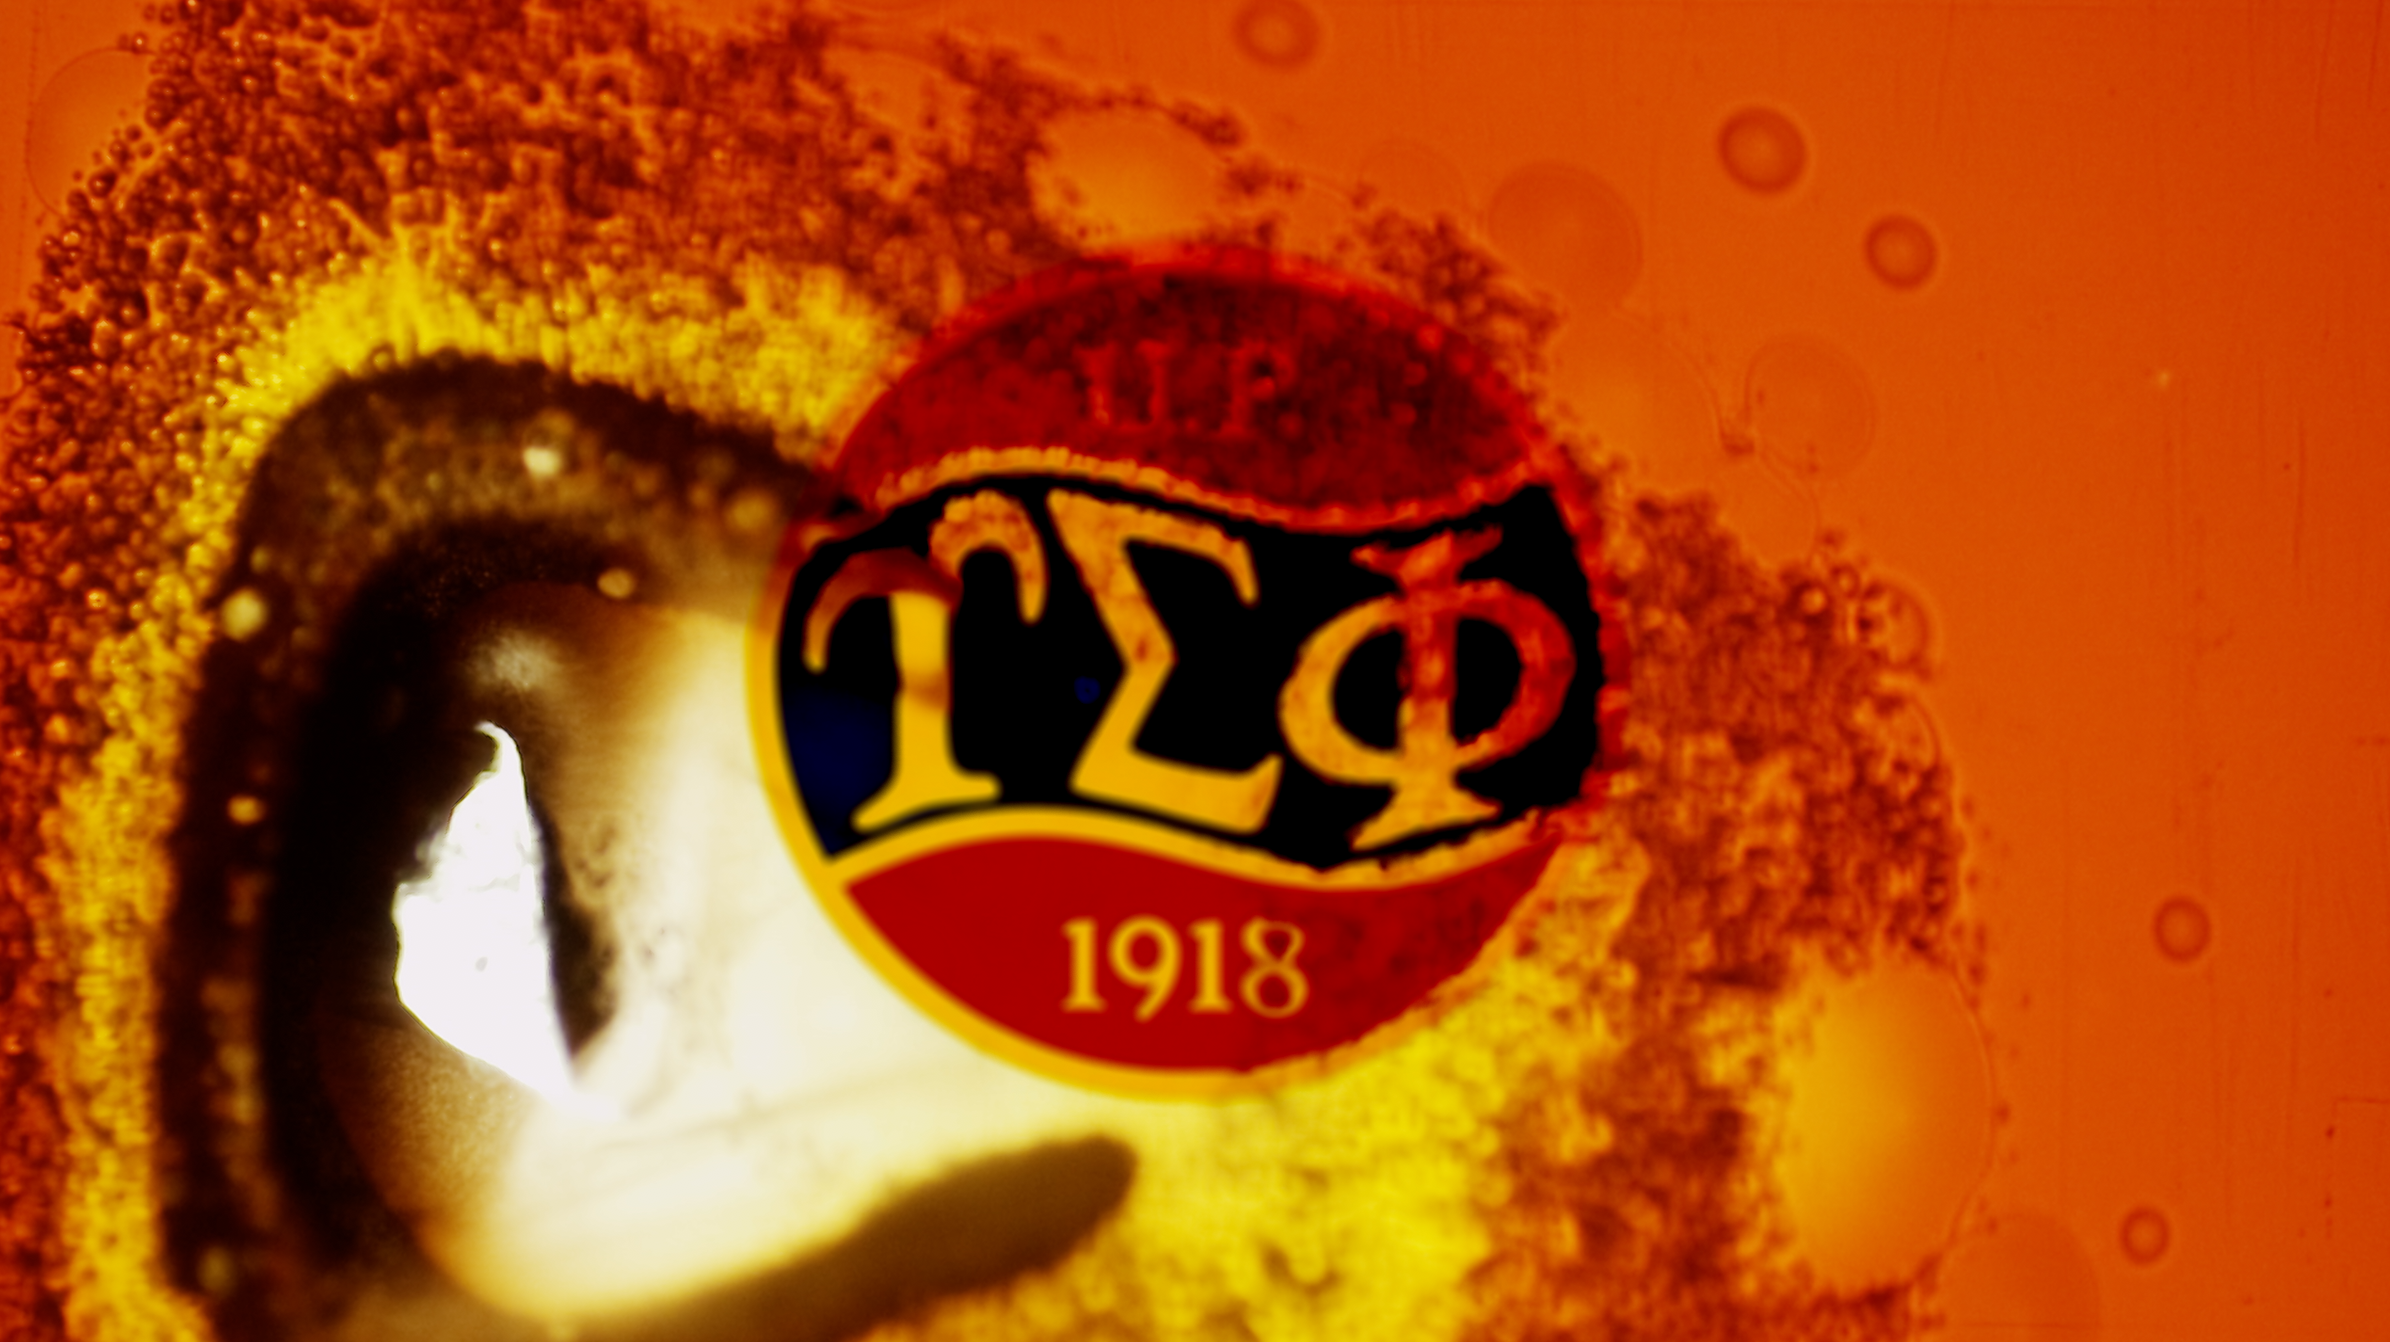 Upsilon Sigma Phi logo burned in a celluloid-like effect